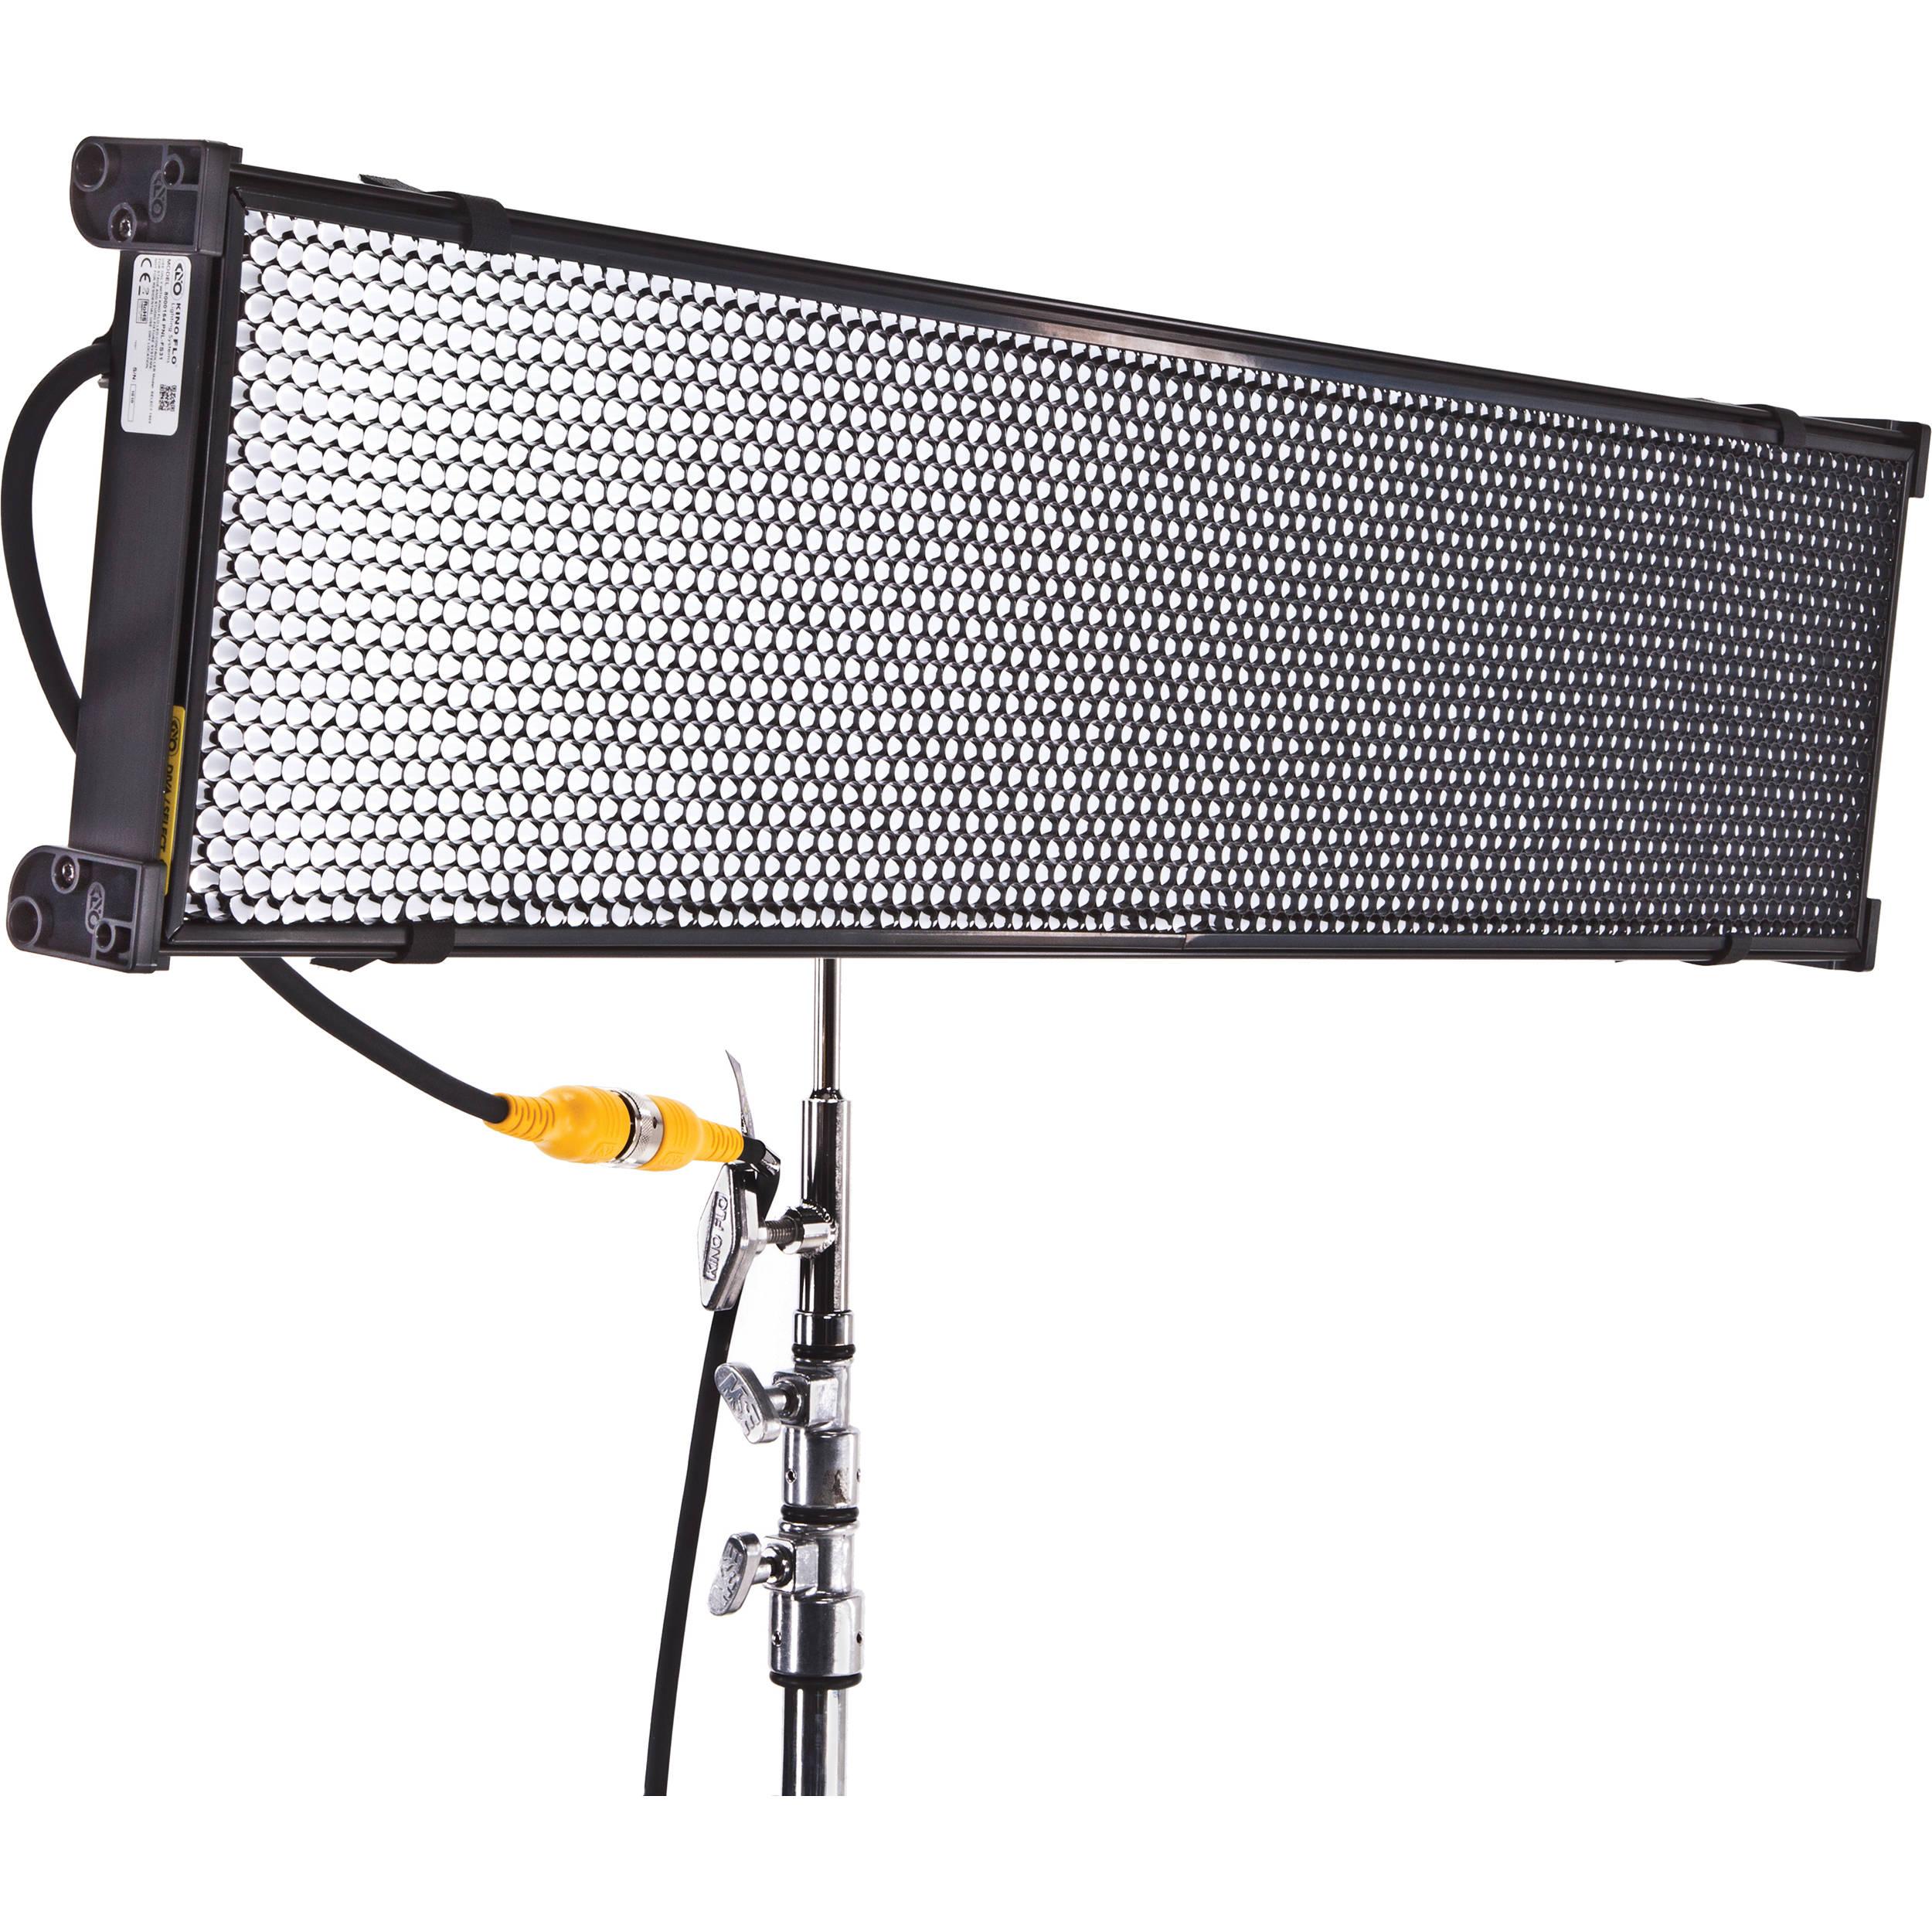 Kino Flo FreeStyle 31 LED Fixture